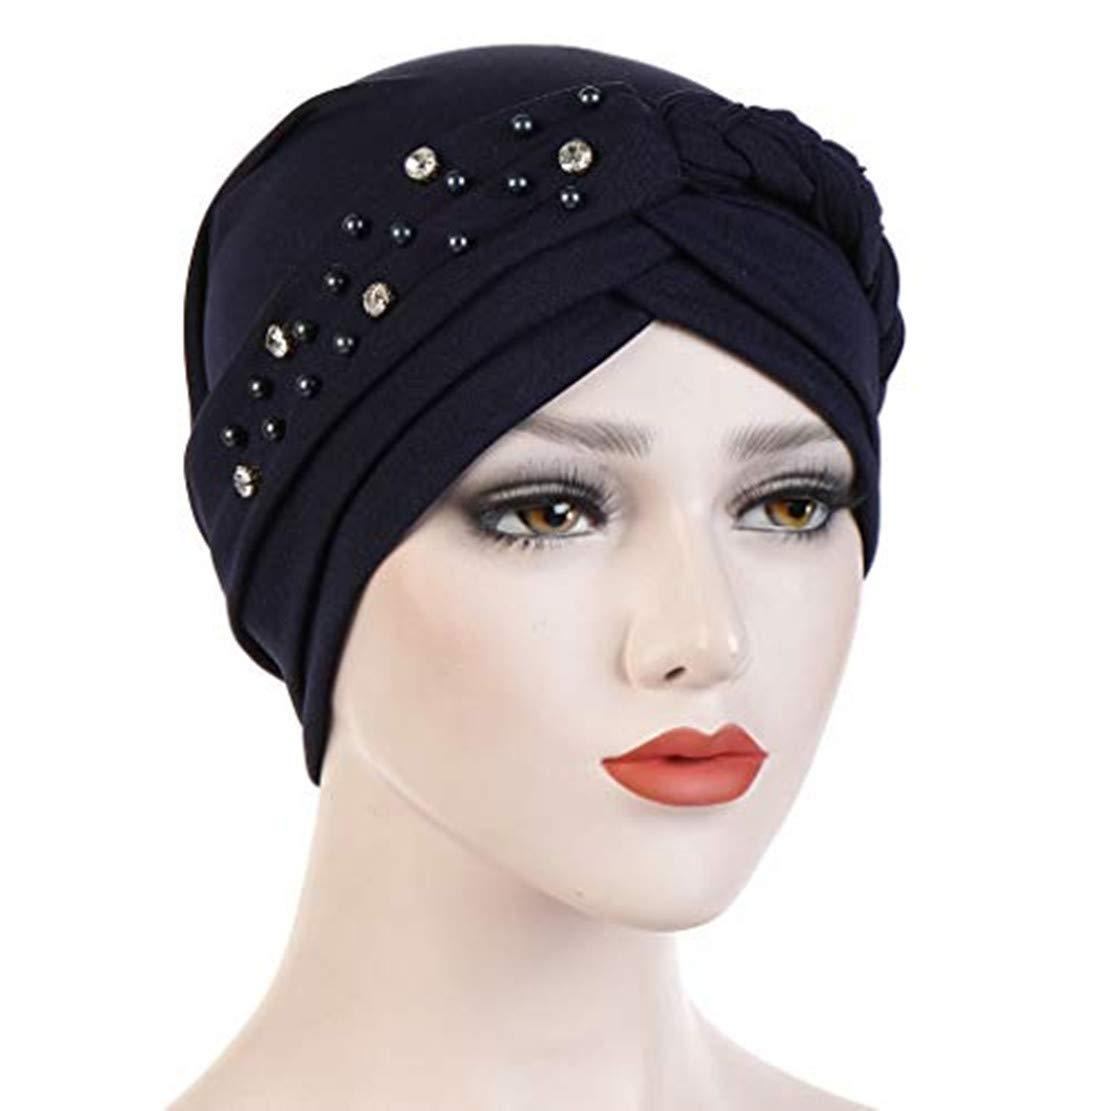 Likecrazy Damen Muslim Turban Muslimisches Kopftuch Stretch Wrap Cap Haarausfall Kopft/ücher Frauen Indien Hut Sommer M/ütze Chemo Krebs Haarausfall Schlaf Make Up